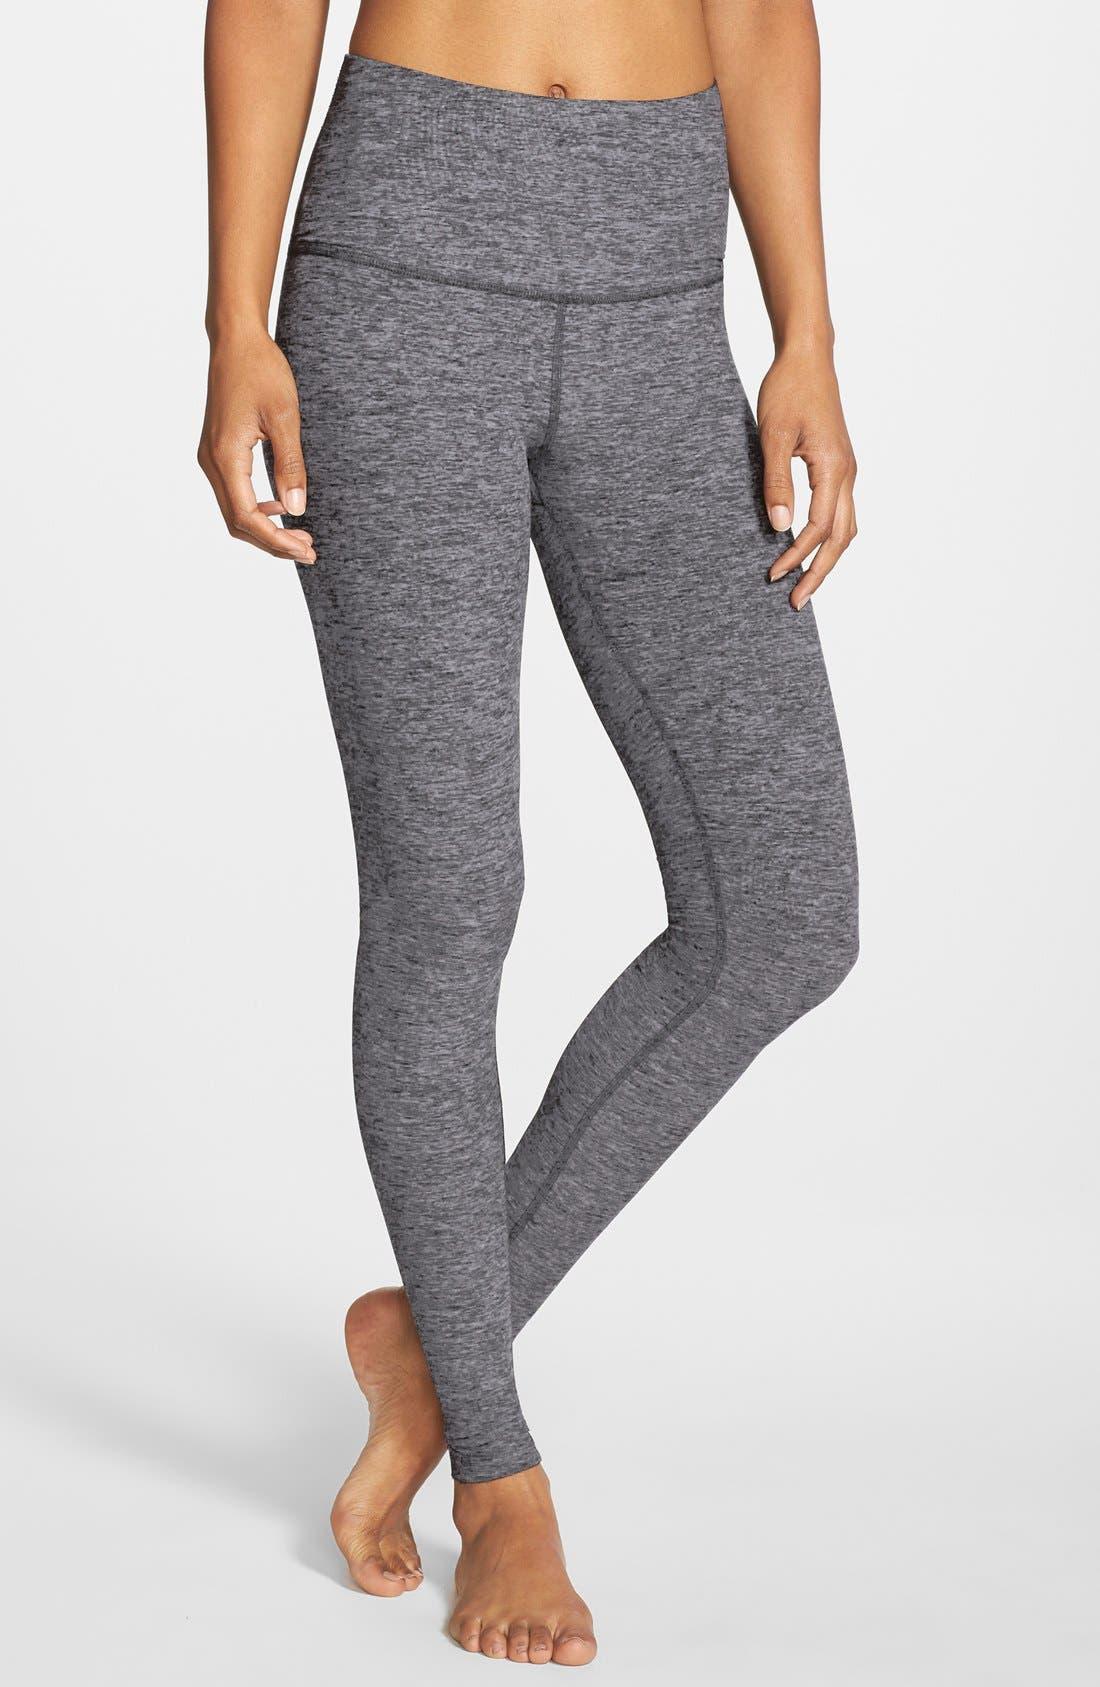 Beyond Yoga High Waist Leggings